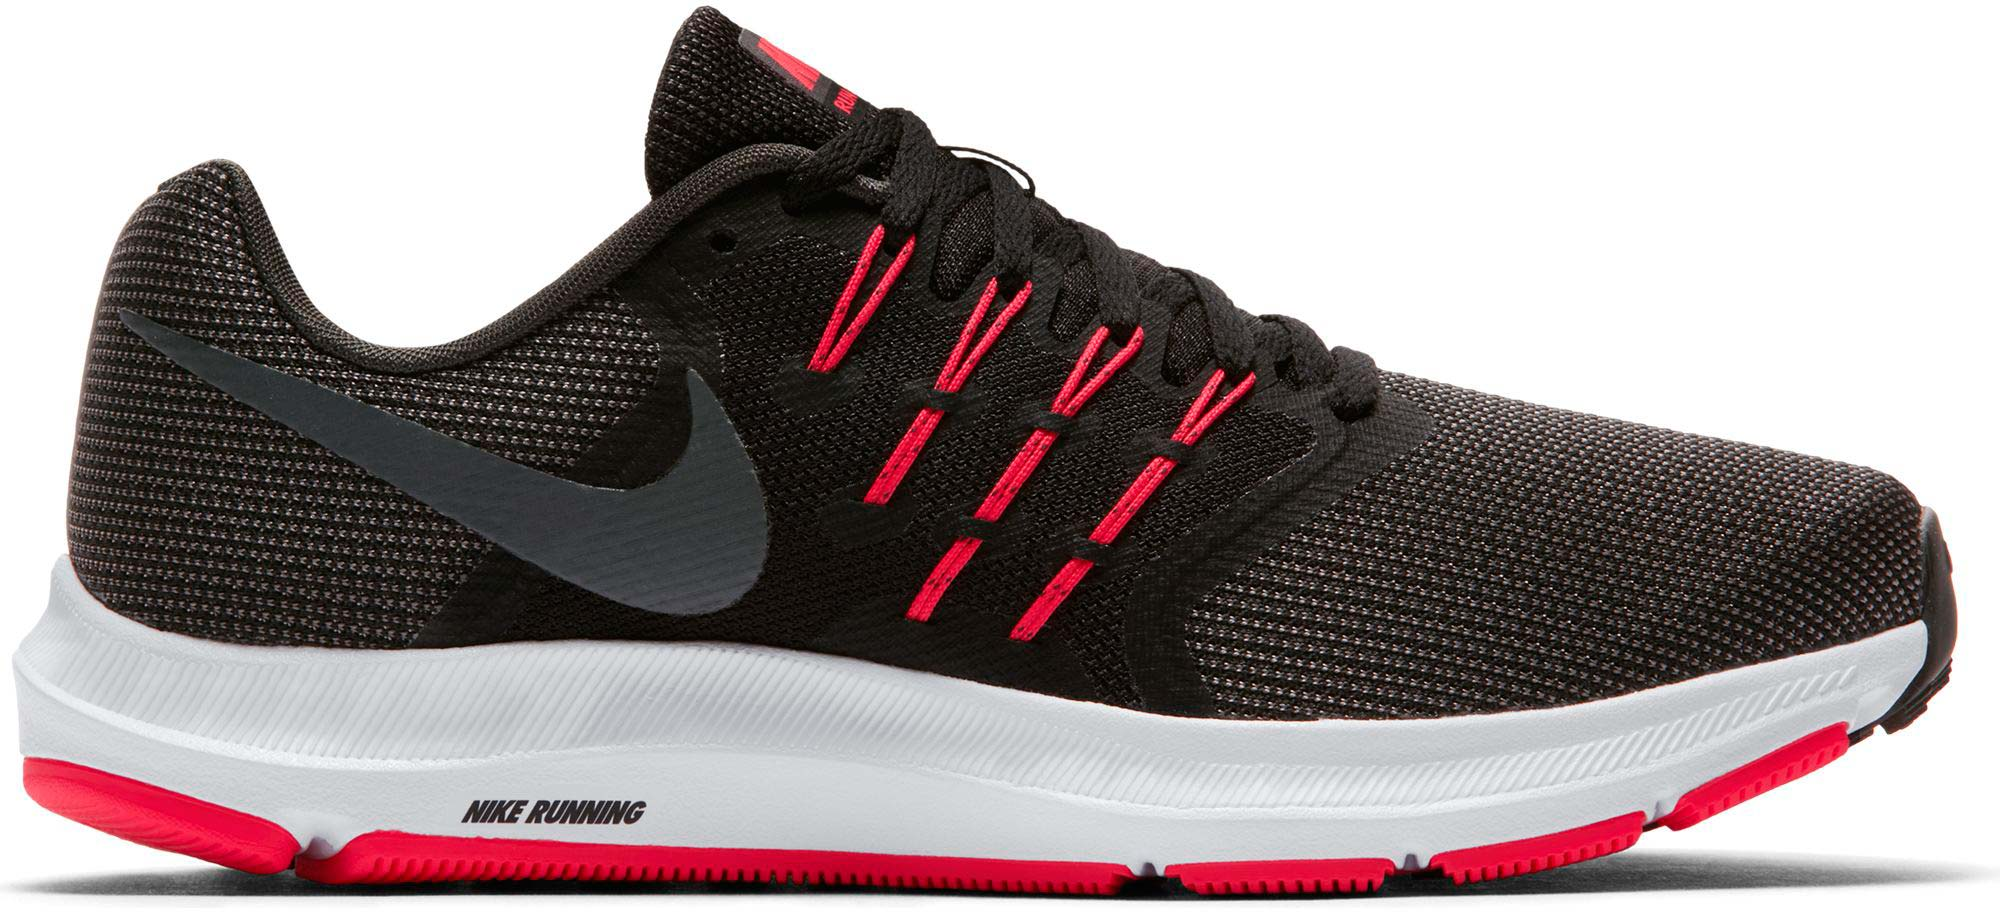 Nike RUN SWIFT SHOE W  a01ca7c808